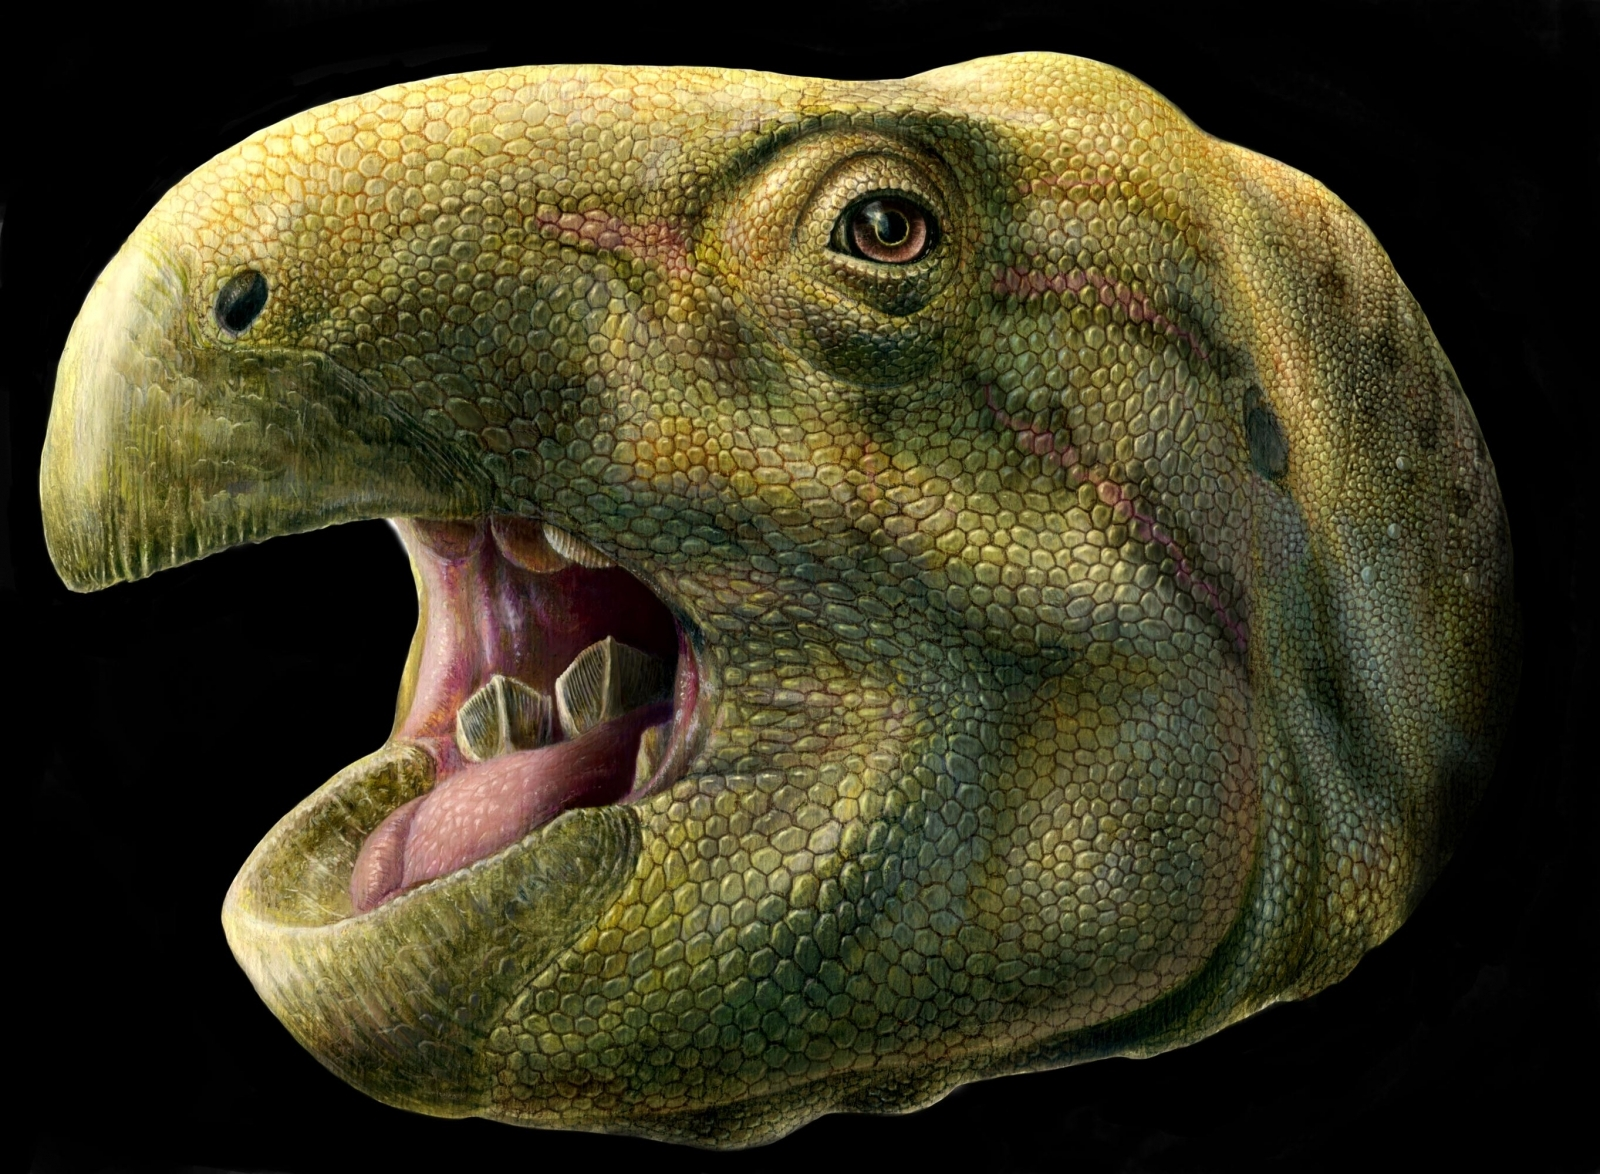 Dinosaur with scissor like teeth